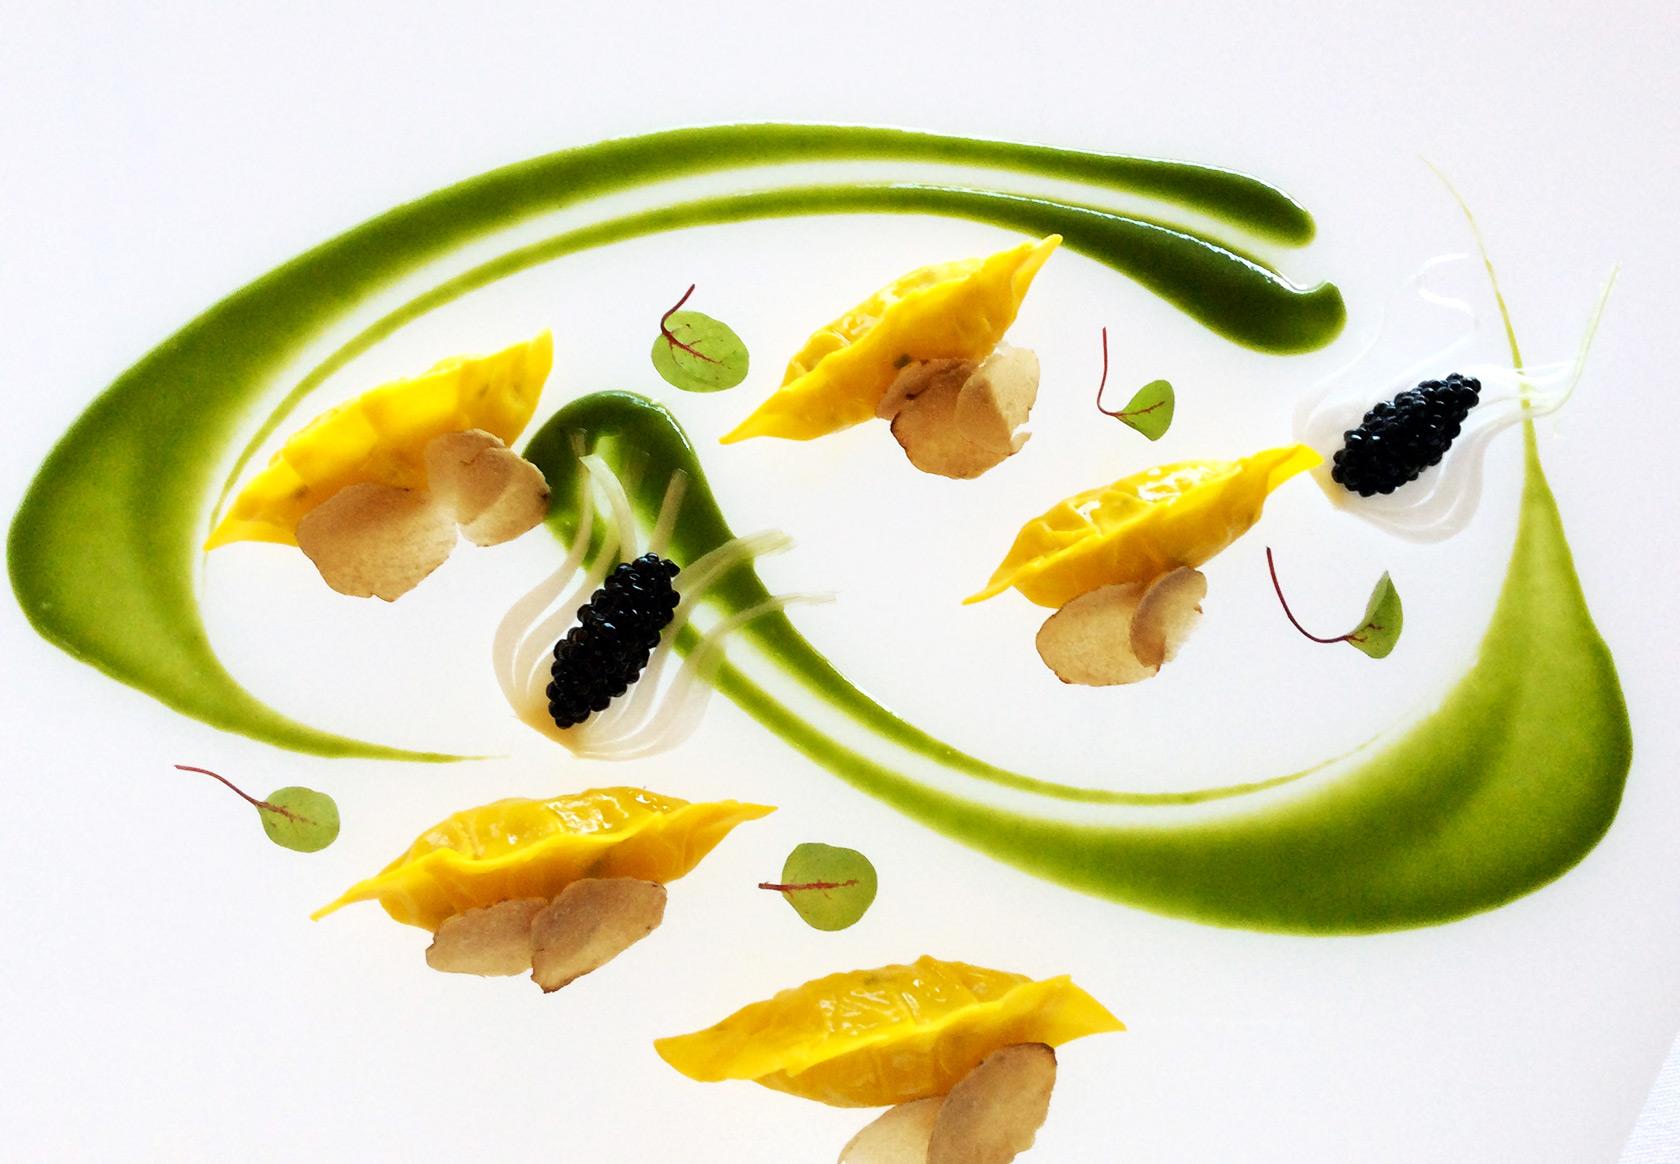 ravioli-tartufobianco-caviale-arnolfo-ristorante_Chef-Gaetano-Trovato